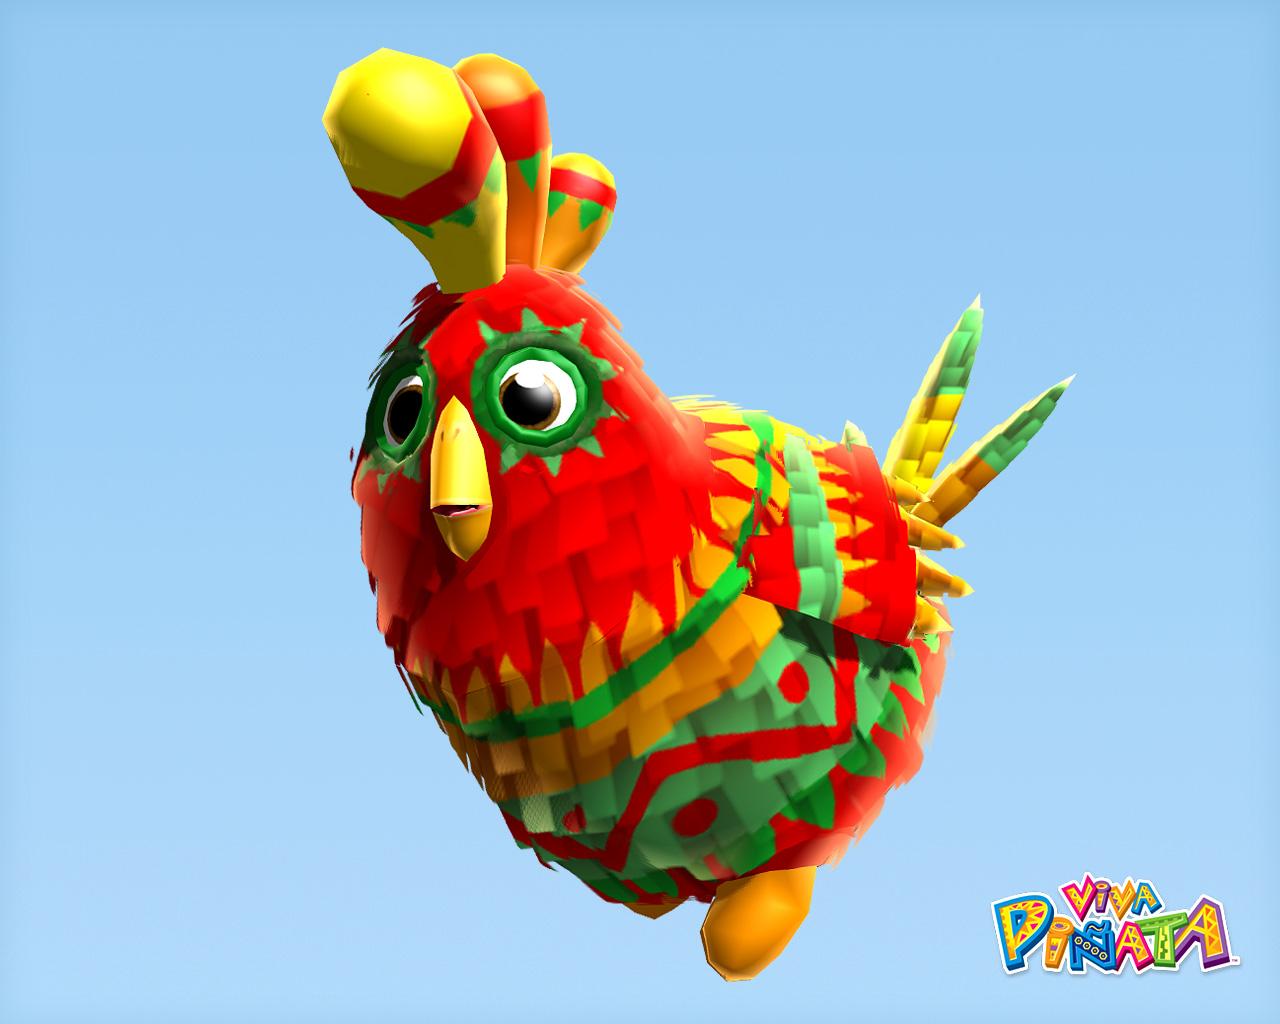 Viva Piñata: Party Animals Achievement Guide & Road Map ...